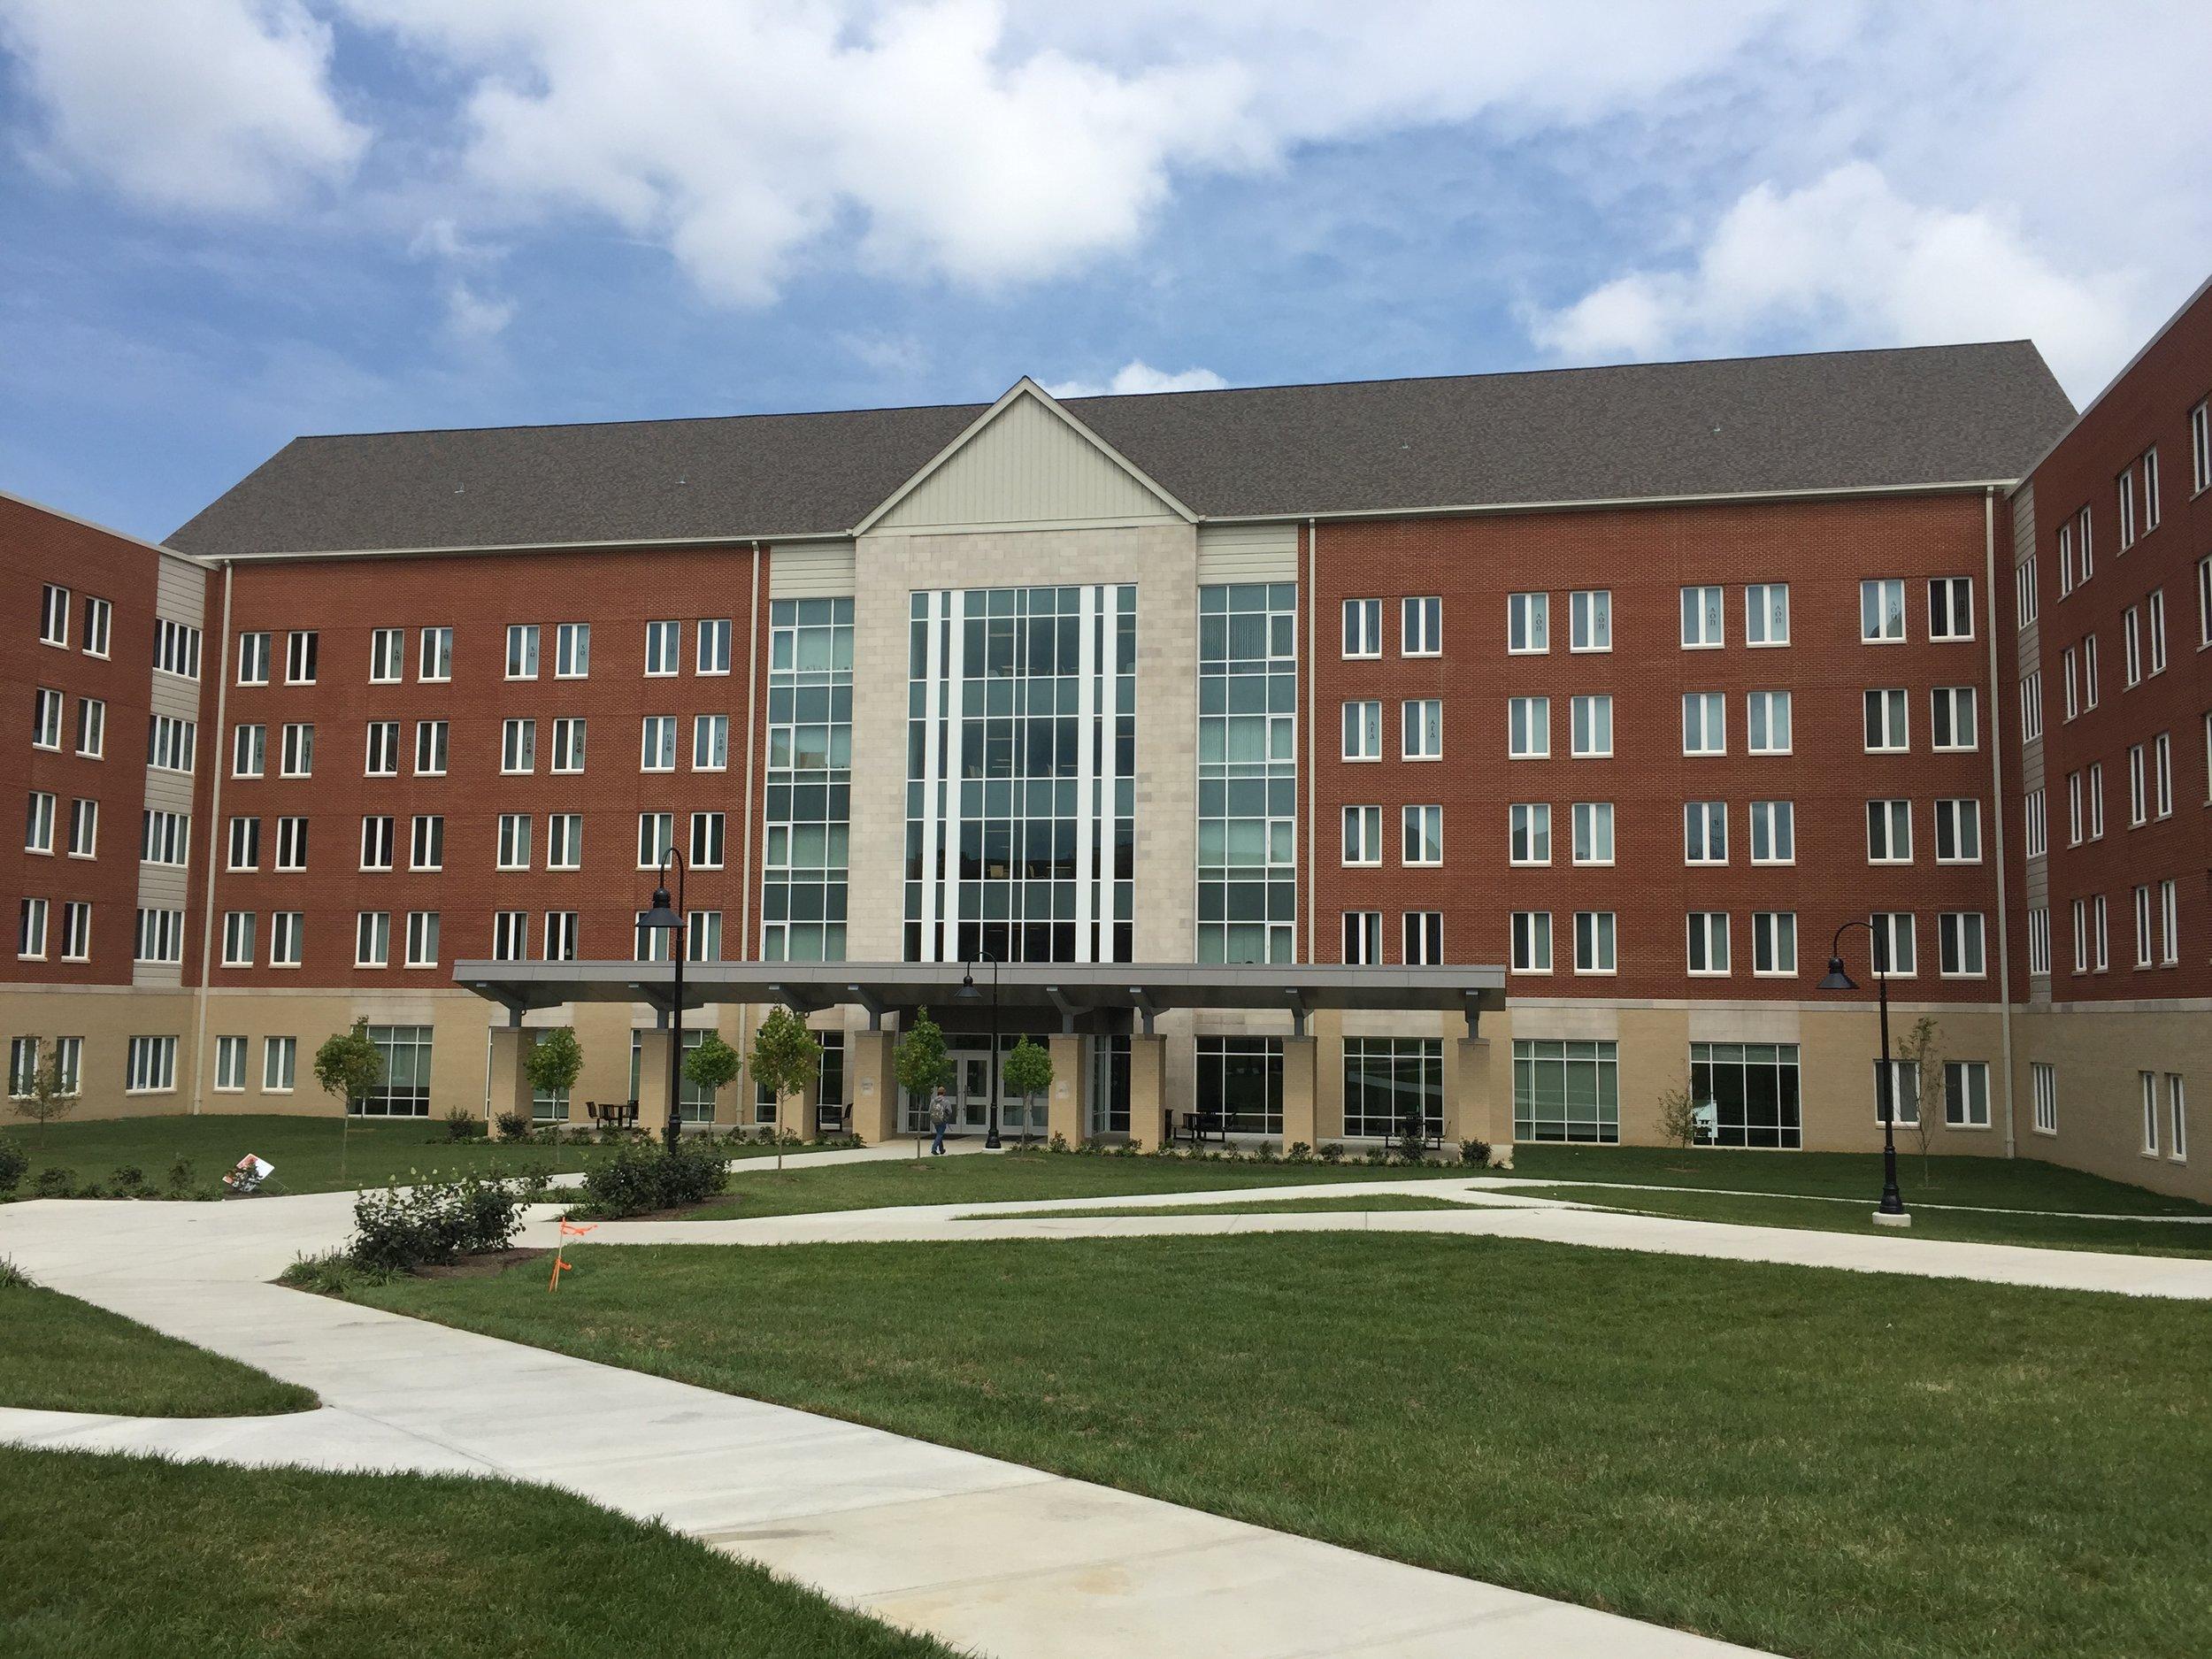 Eastern Kentucky University - North Hall (New Hall B)